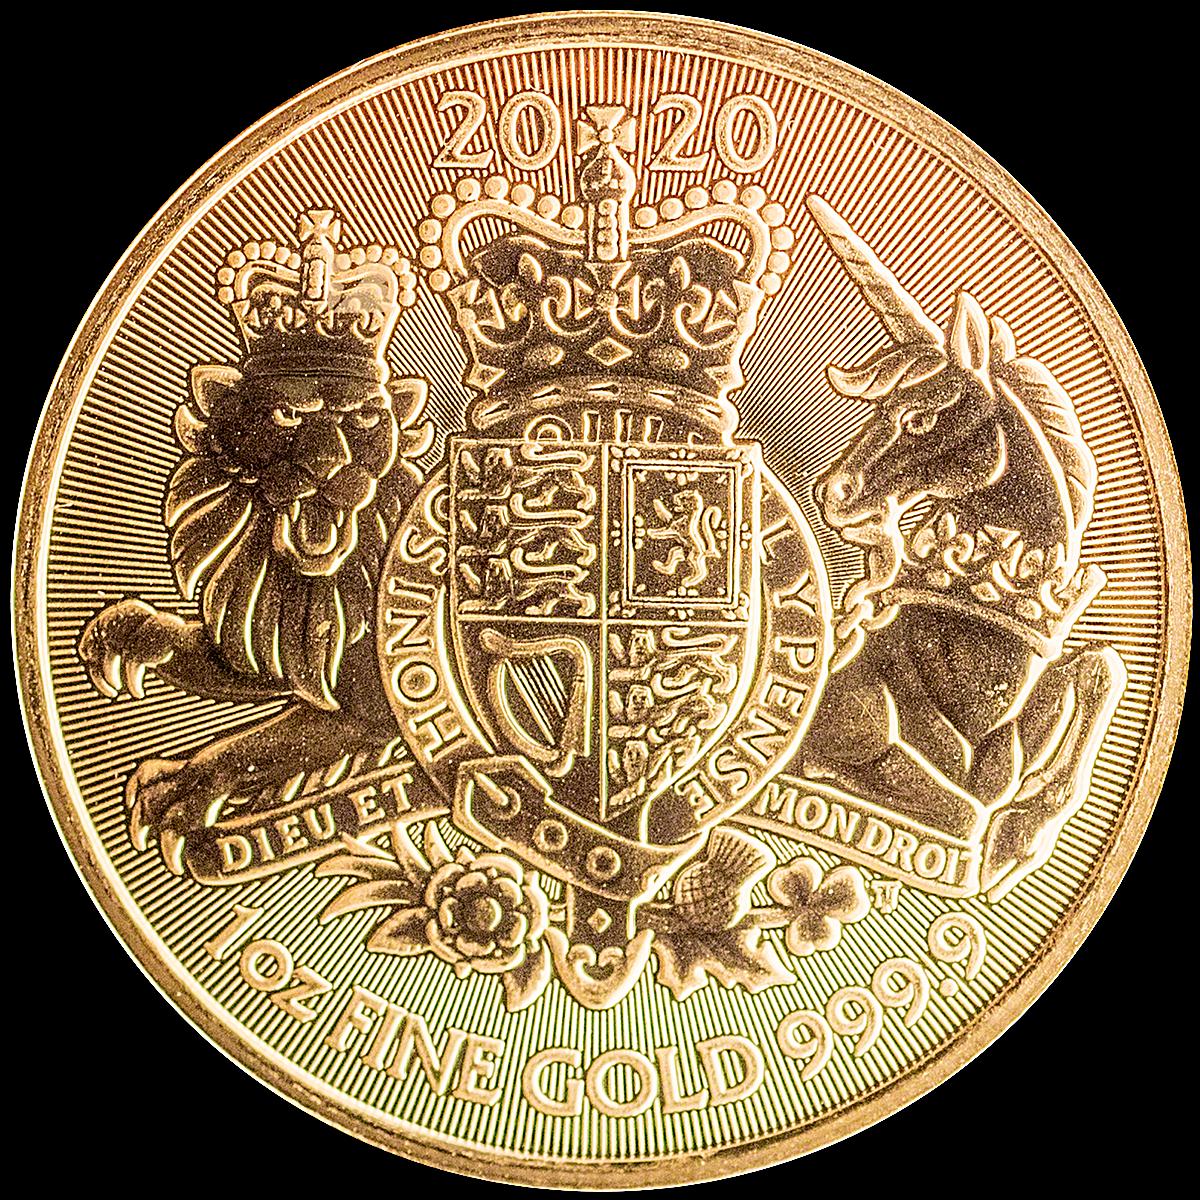 UK Gold Royal Arms 2020 - 1 Oz